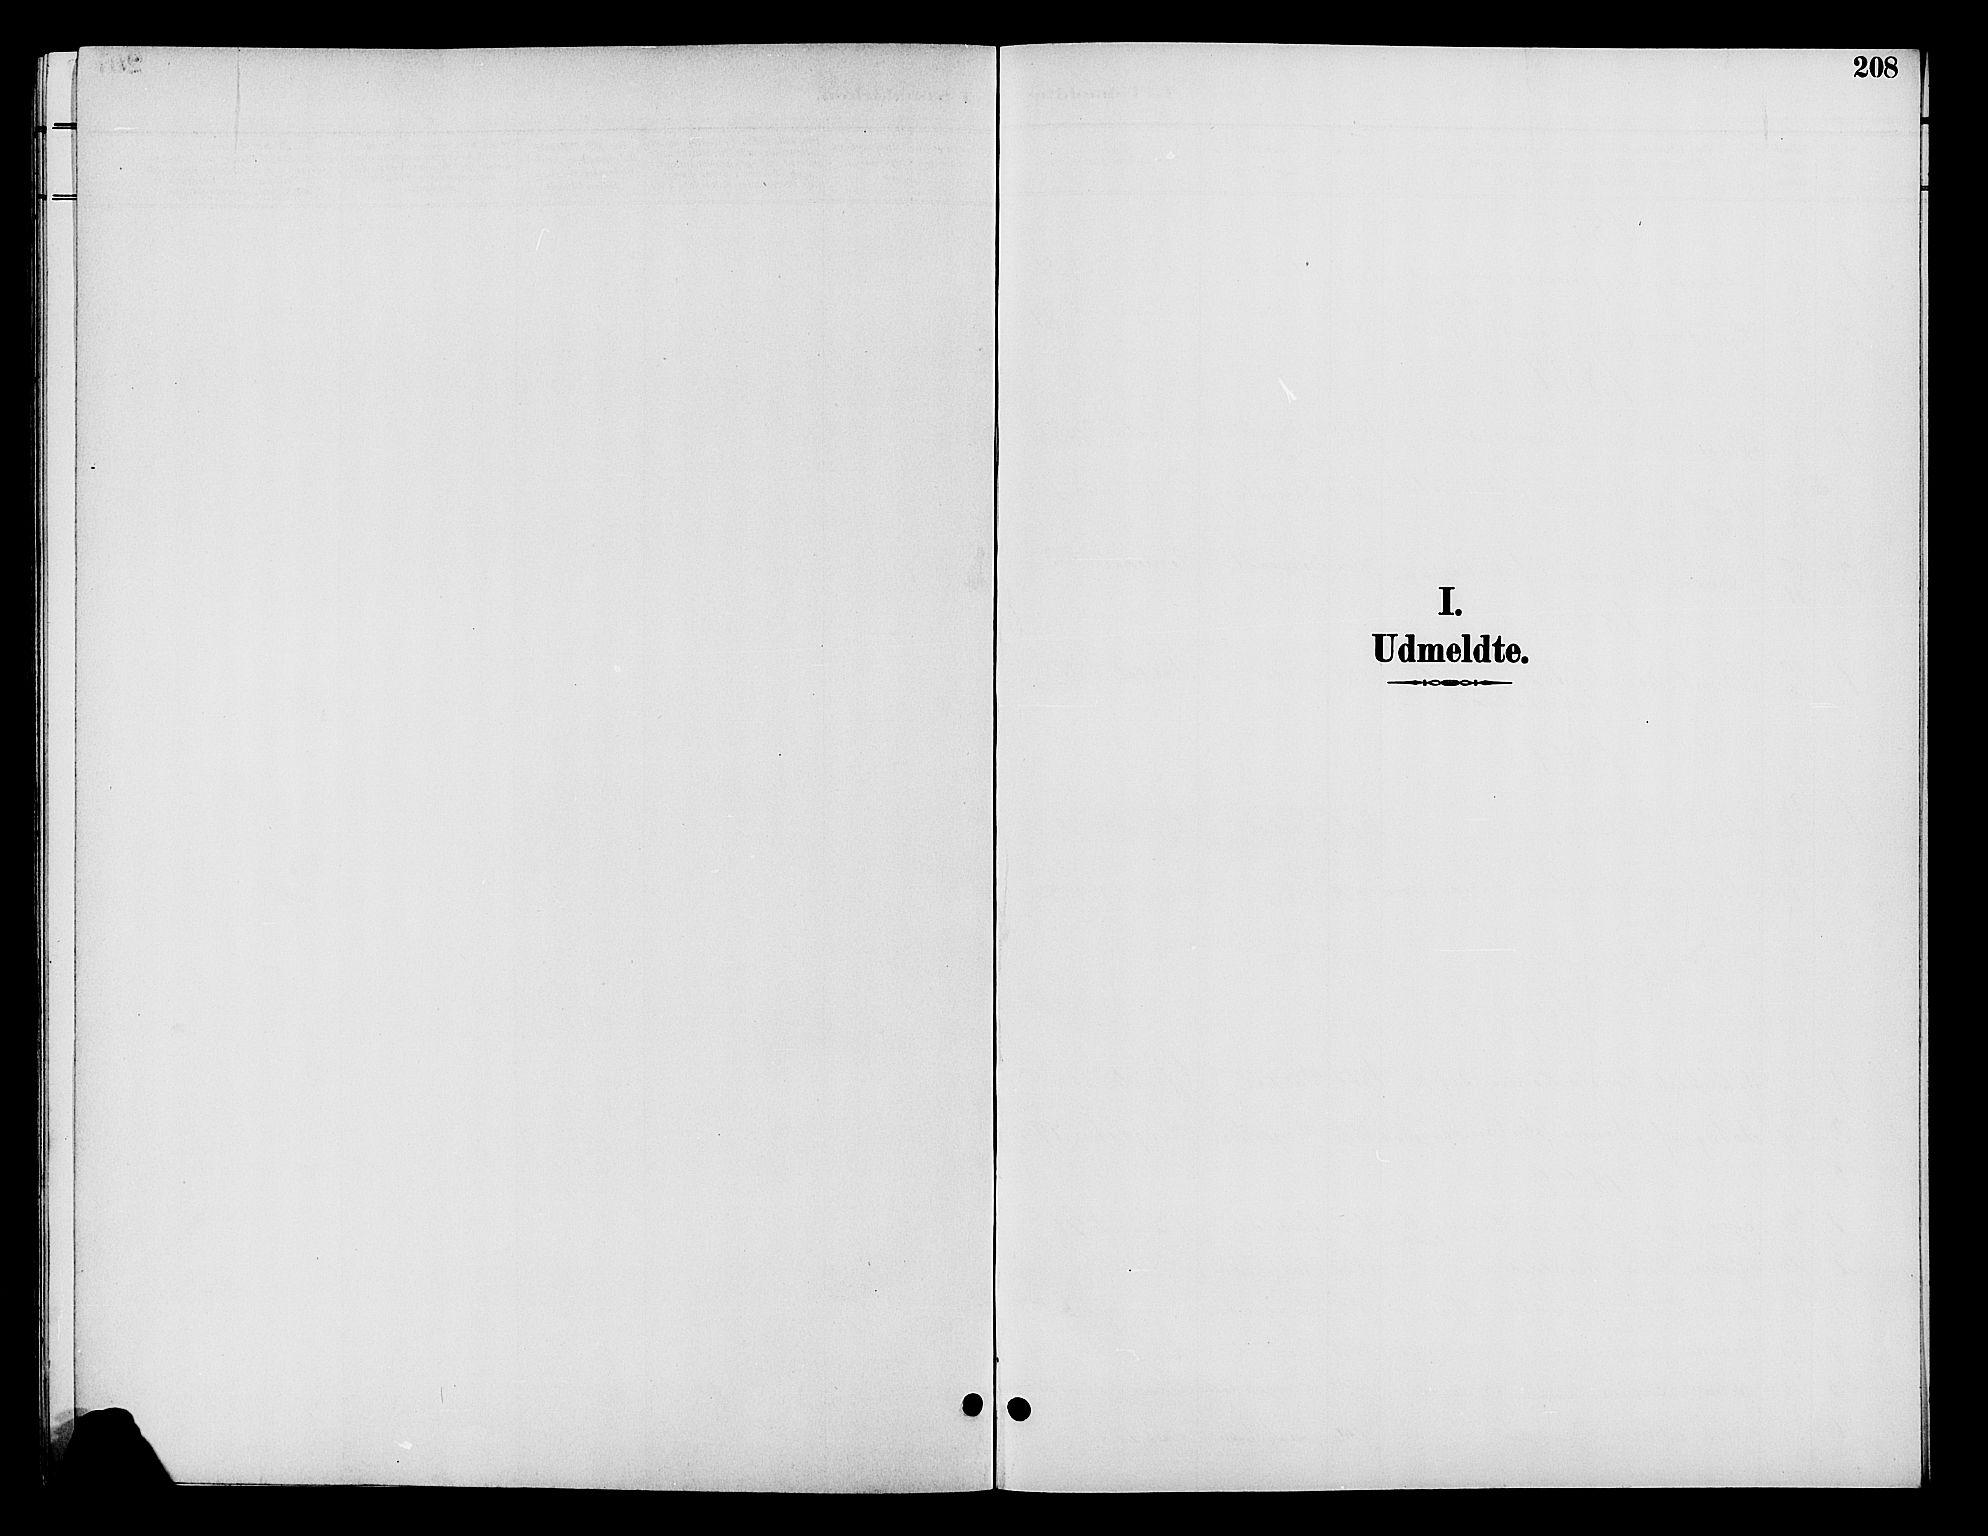 SAH, Vardal prestekontor, H/Ha/Hab/L0009: Klokkerbok nr. 9, 1894-1902, s. 208